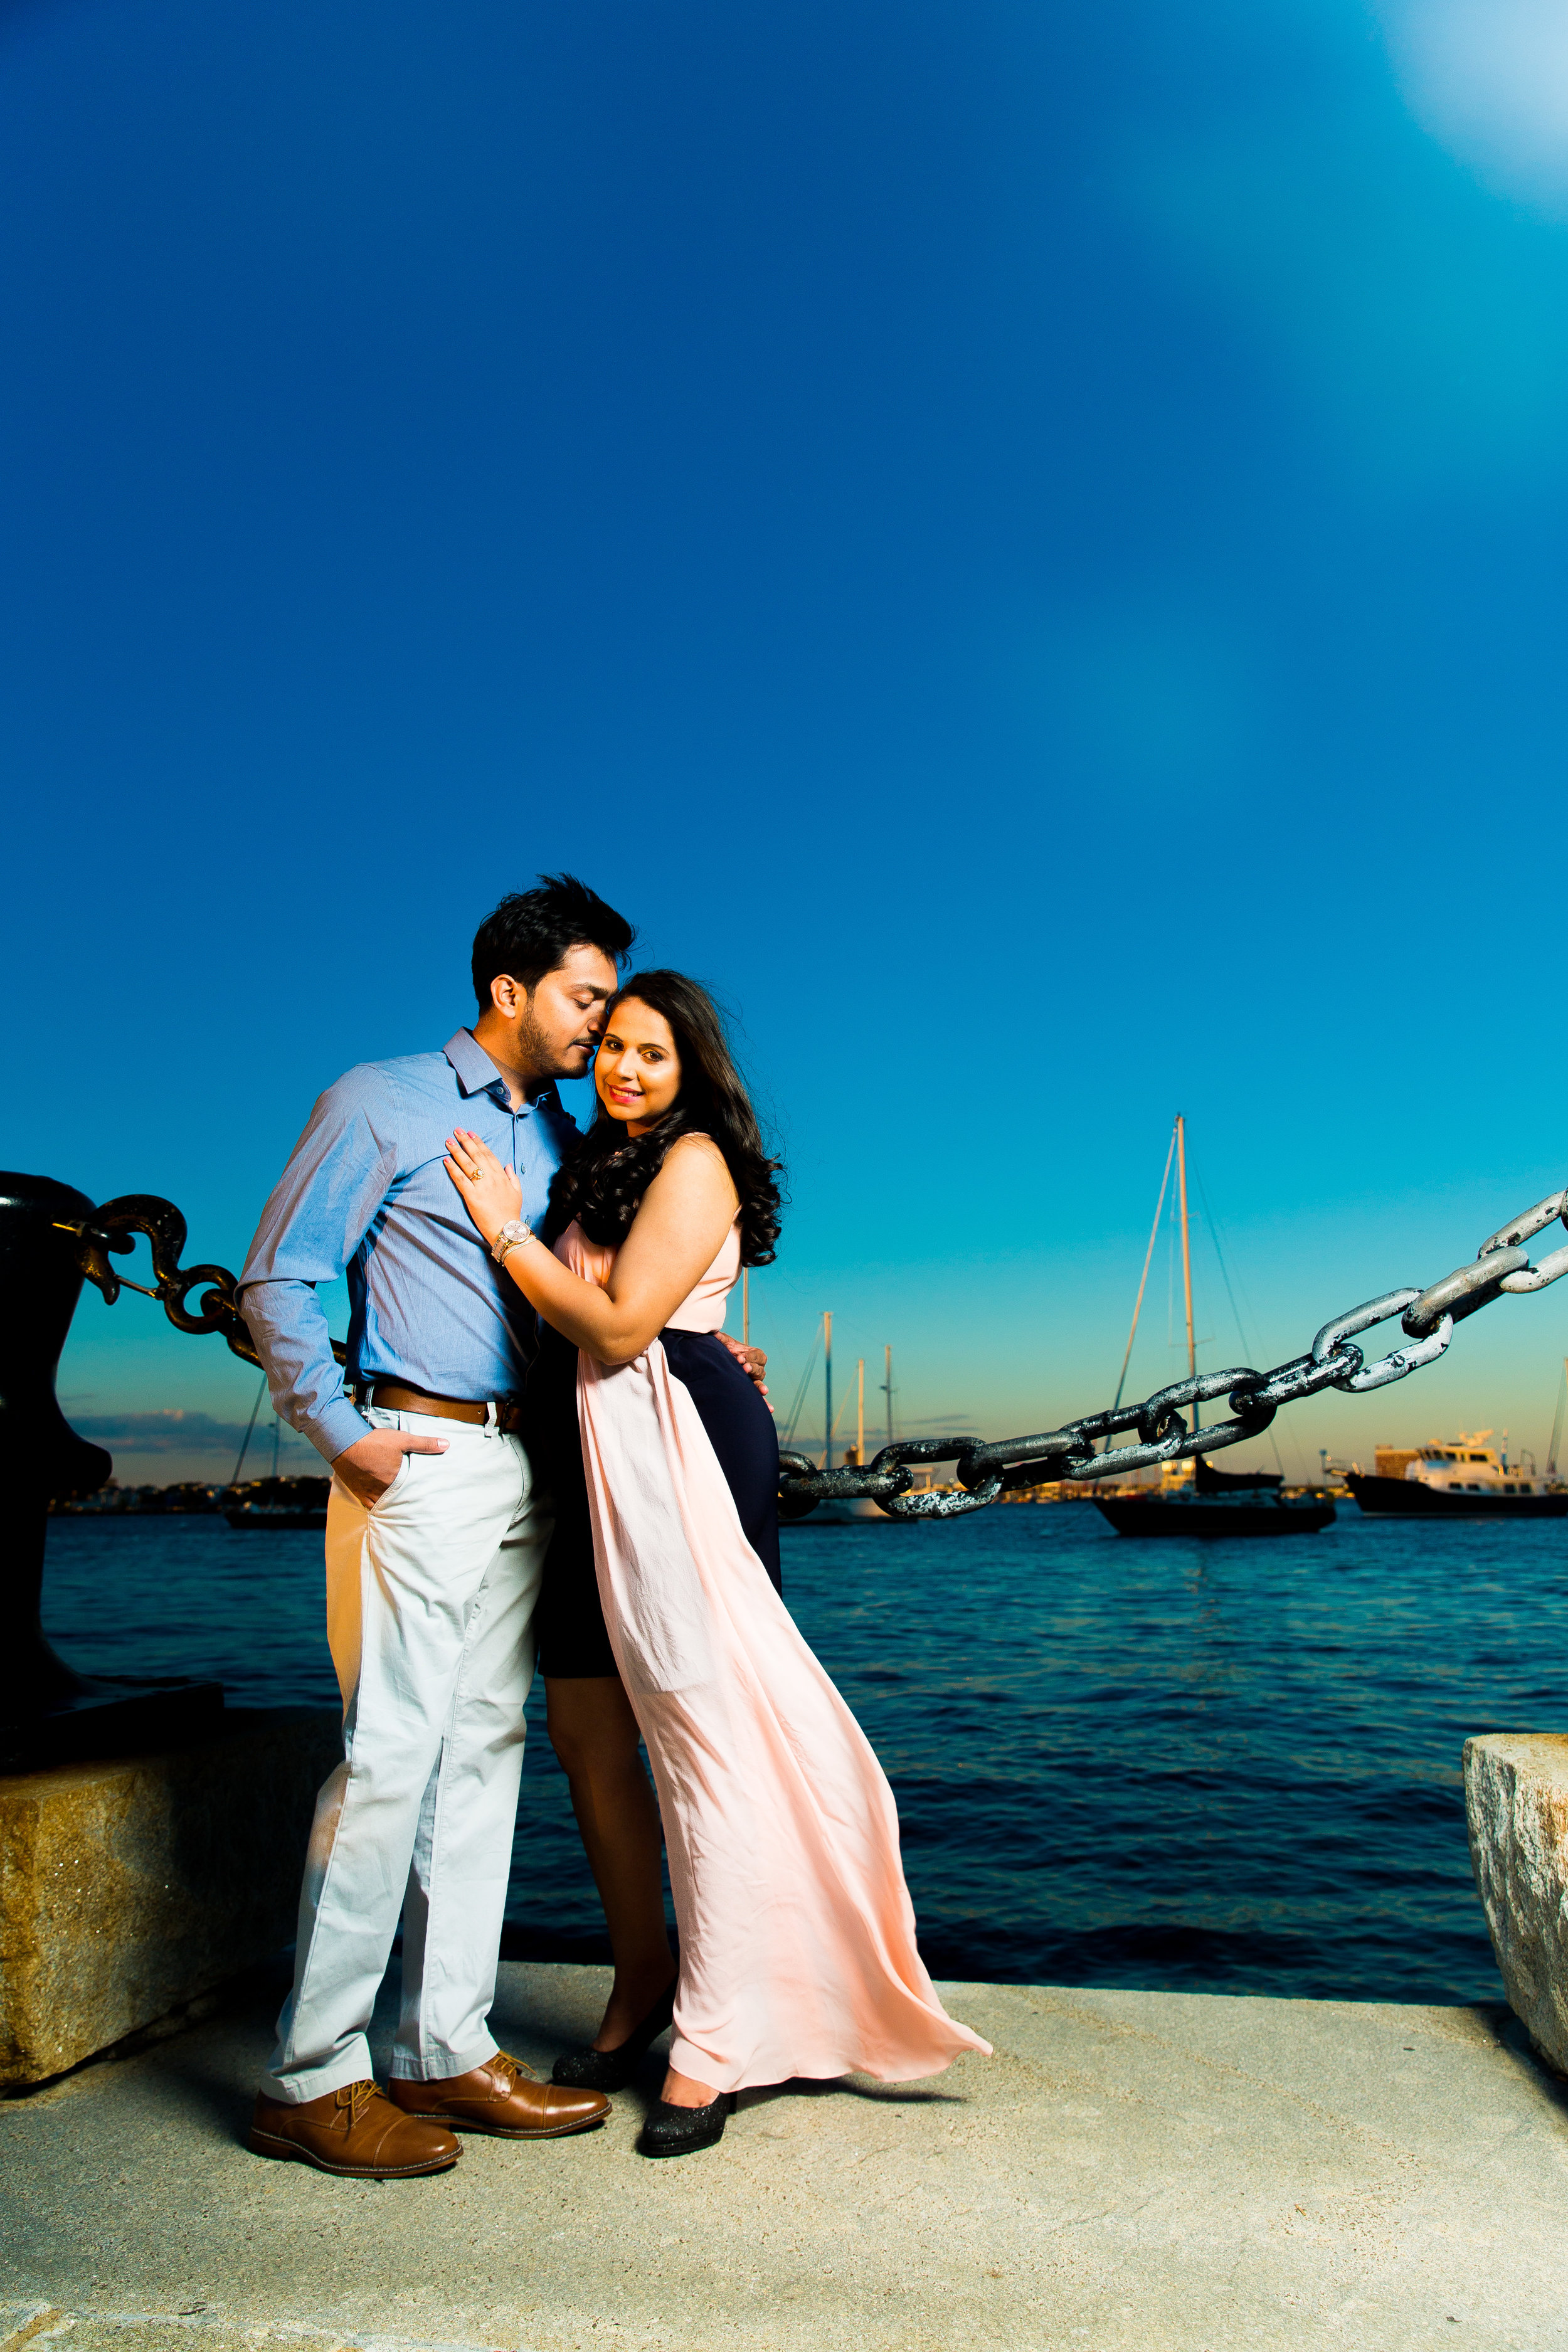 314A1140-Giovanni The Photographer-Boston Engagement Session-Christopher Columbus Park - Boston Waterfront.jpg